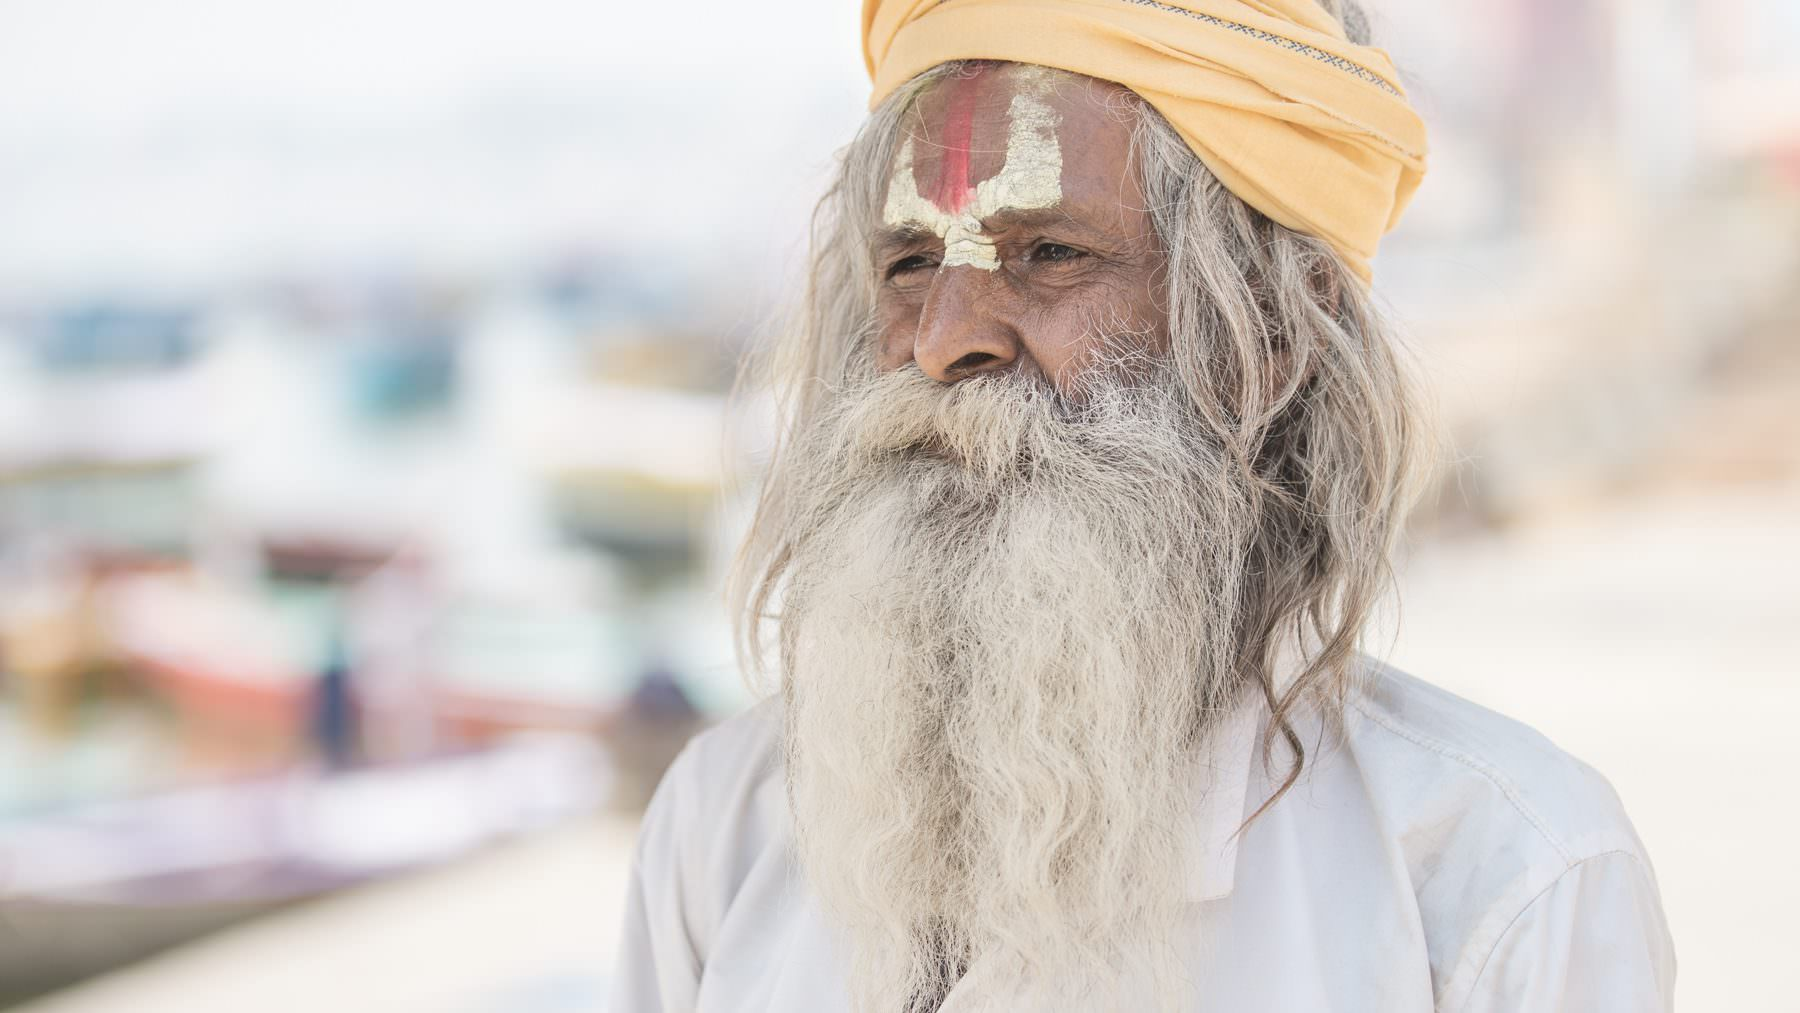 India, Varanasi, Ganga, White Wise Sadhu